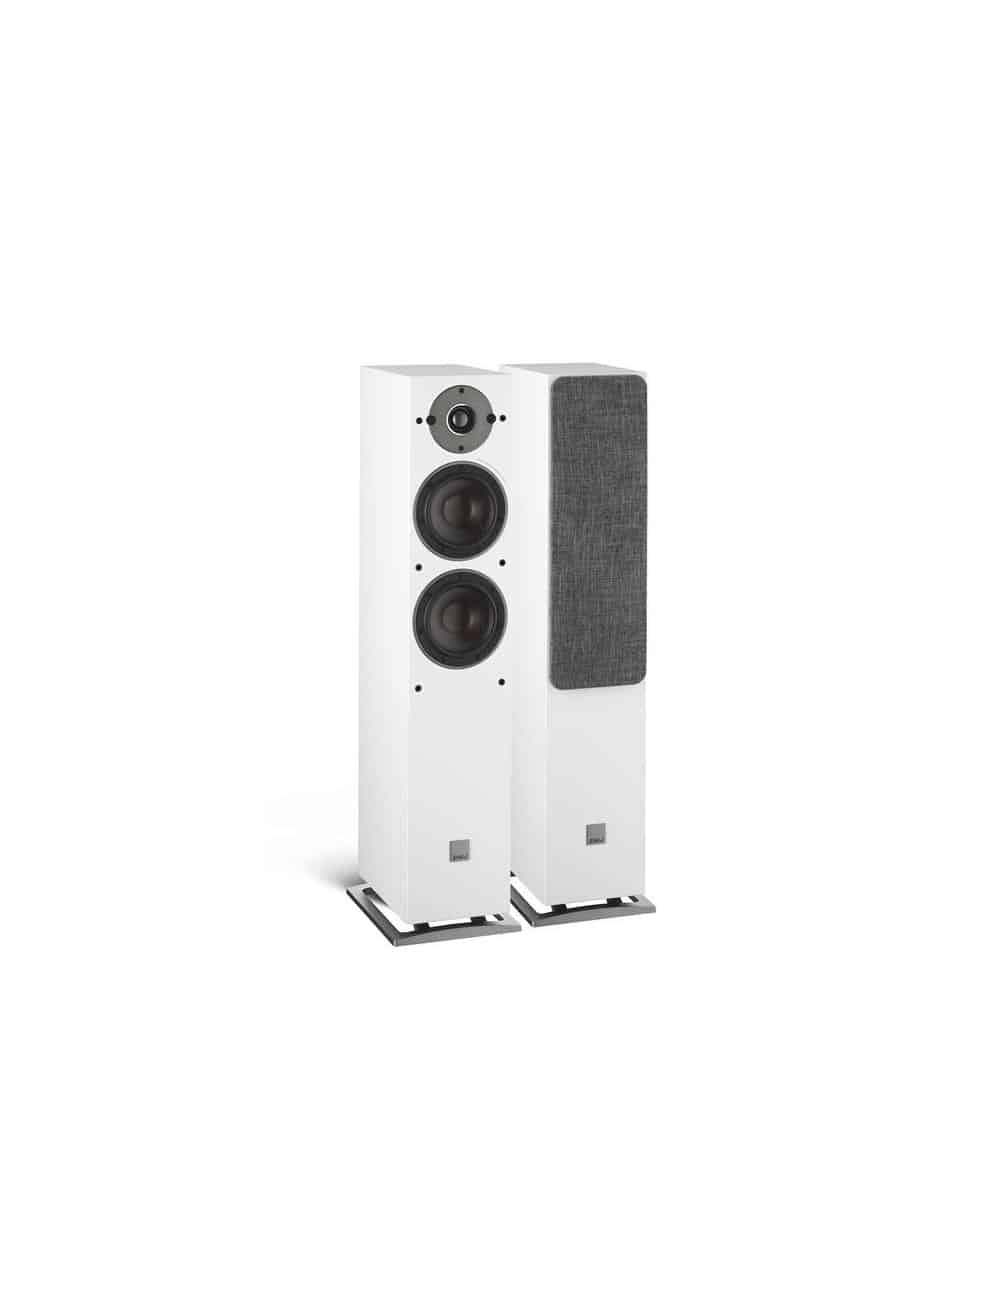 diffusori acustici da pavimento Dali Oberon 5 per HiFi e Home Cinema, finitura bianca